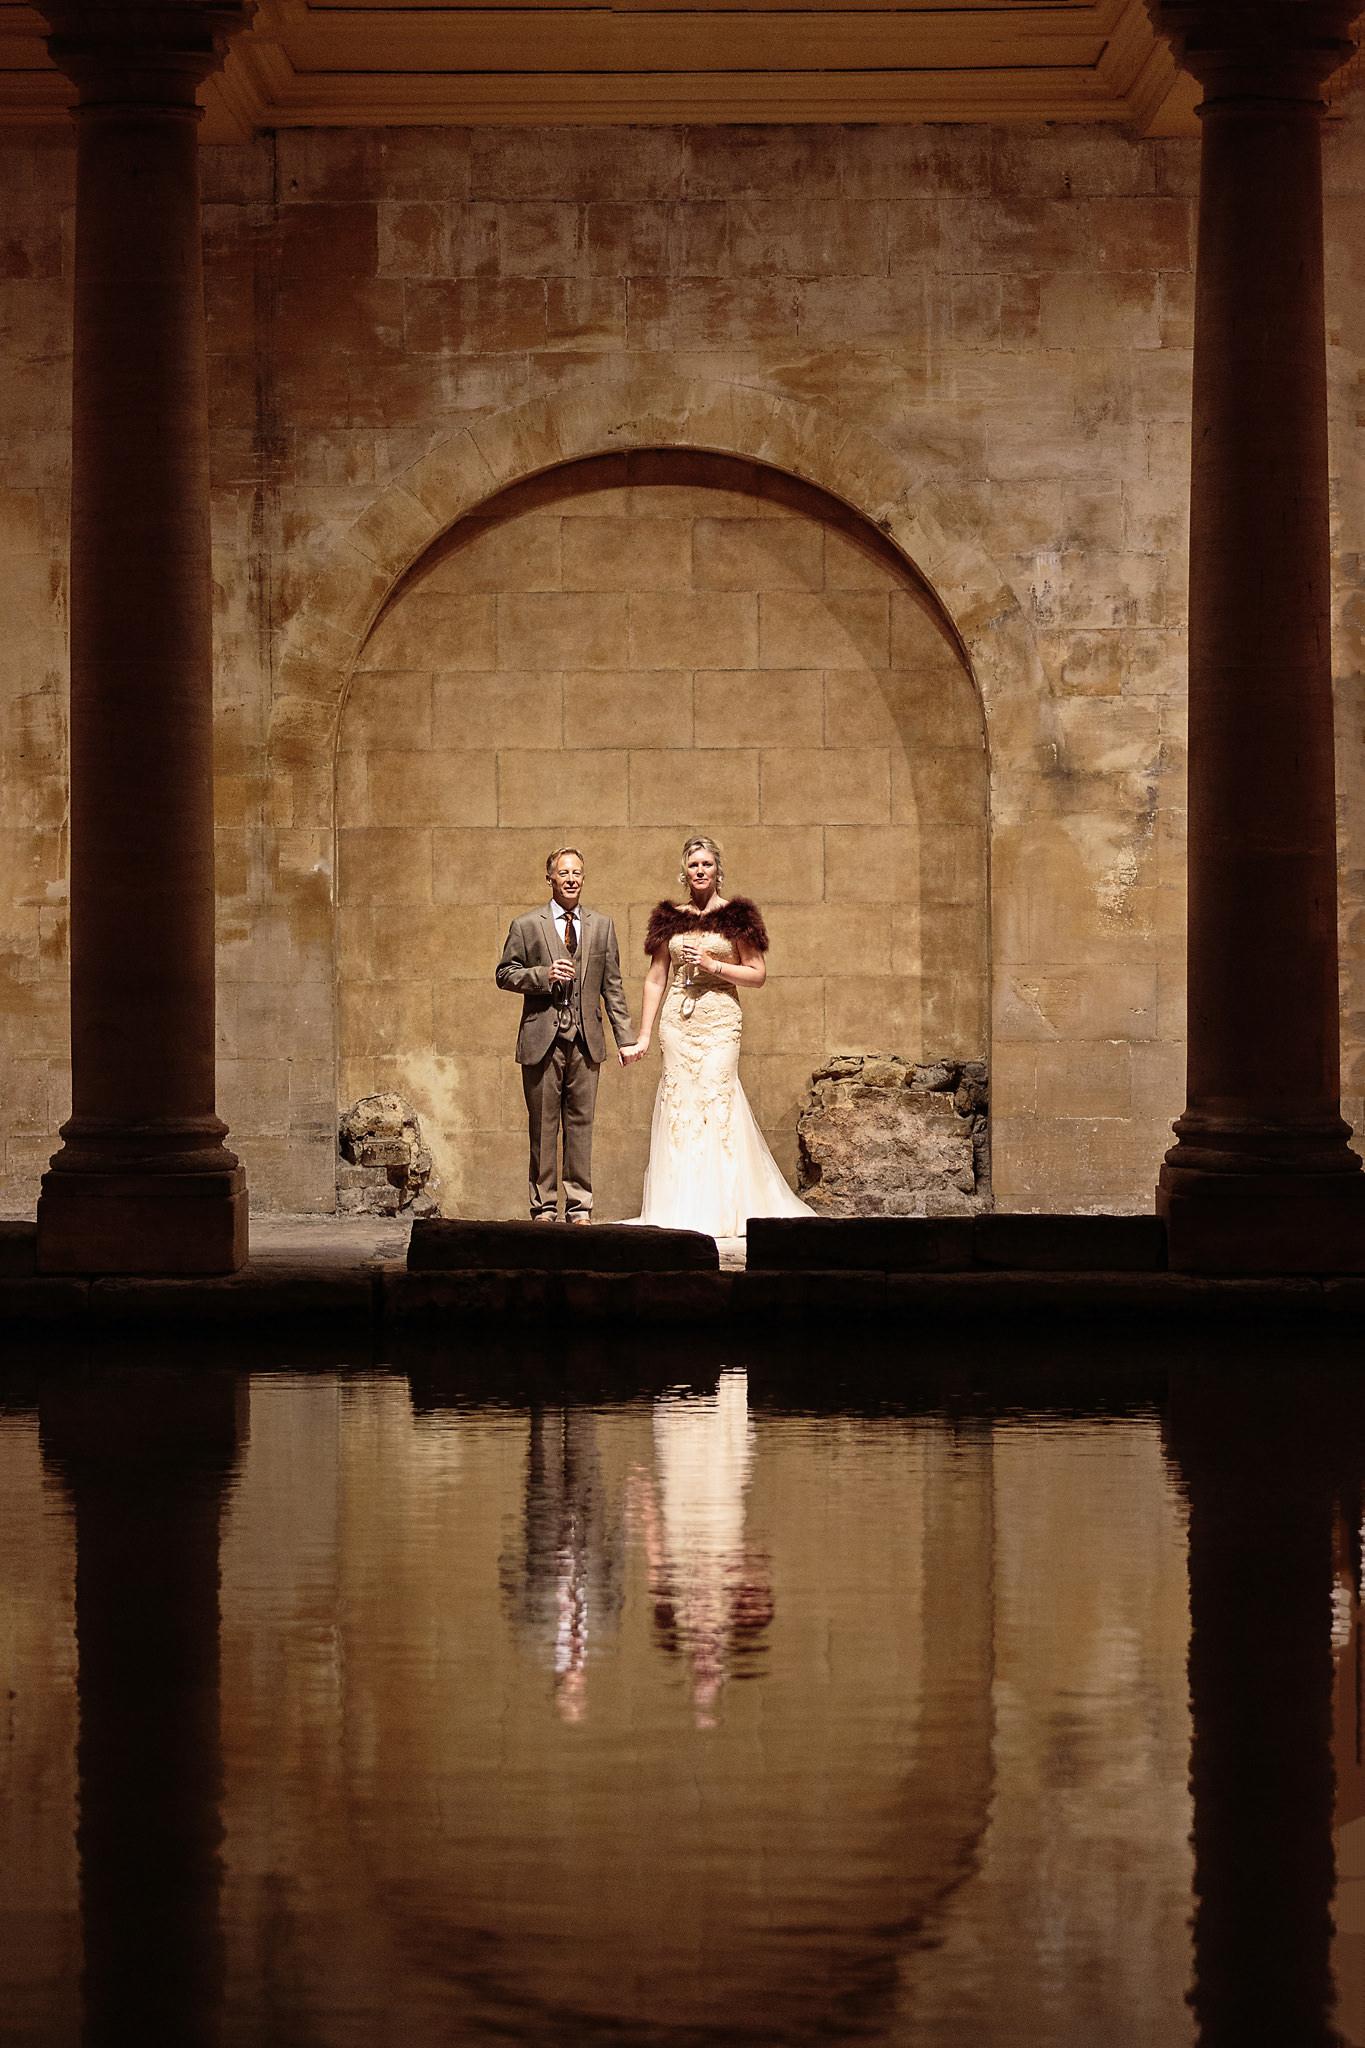 Wedding photography at the Roman Baths in Bath